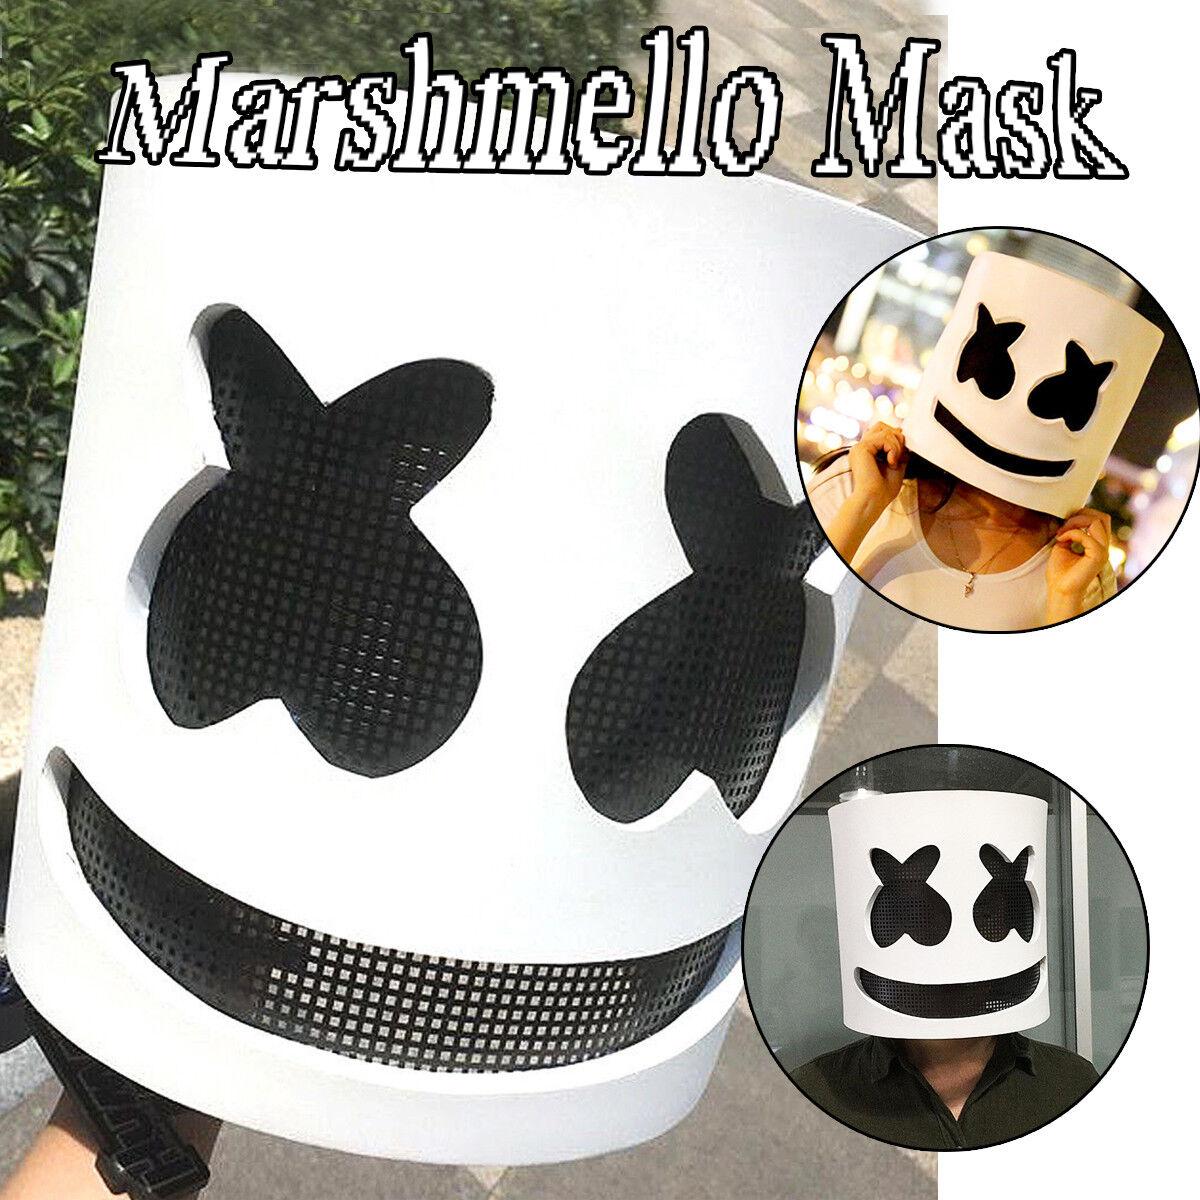 DJ Marshmello Maske Cosplay Kostüm Helm Kopf Halloween Party Props Requisiten A